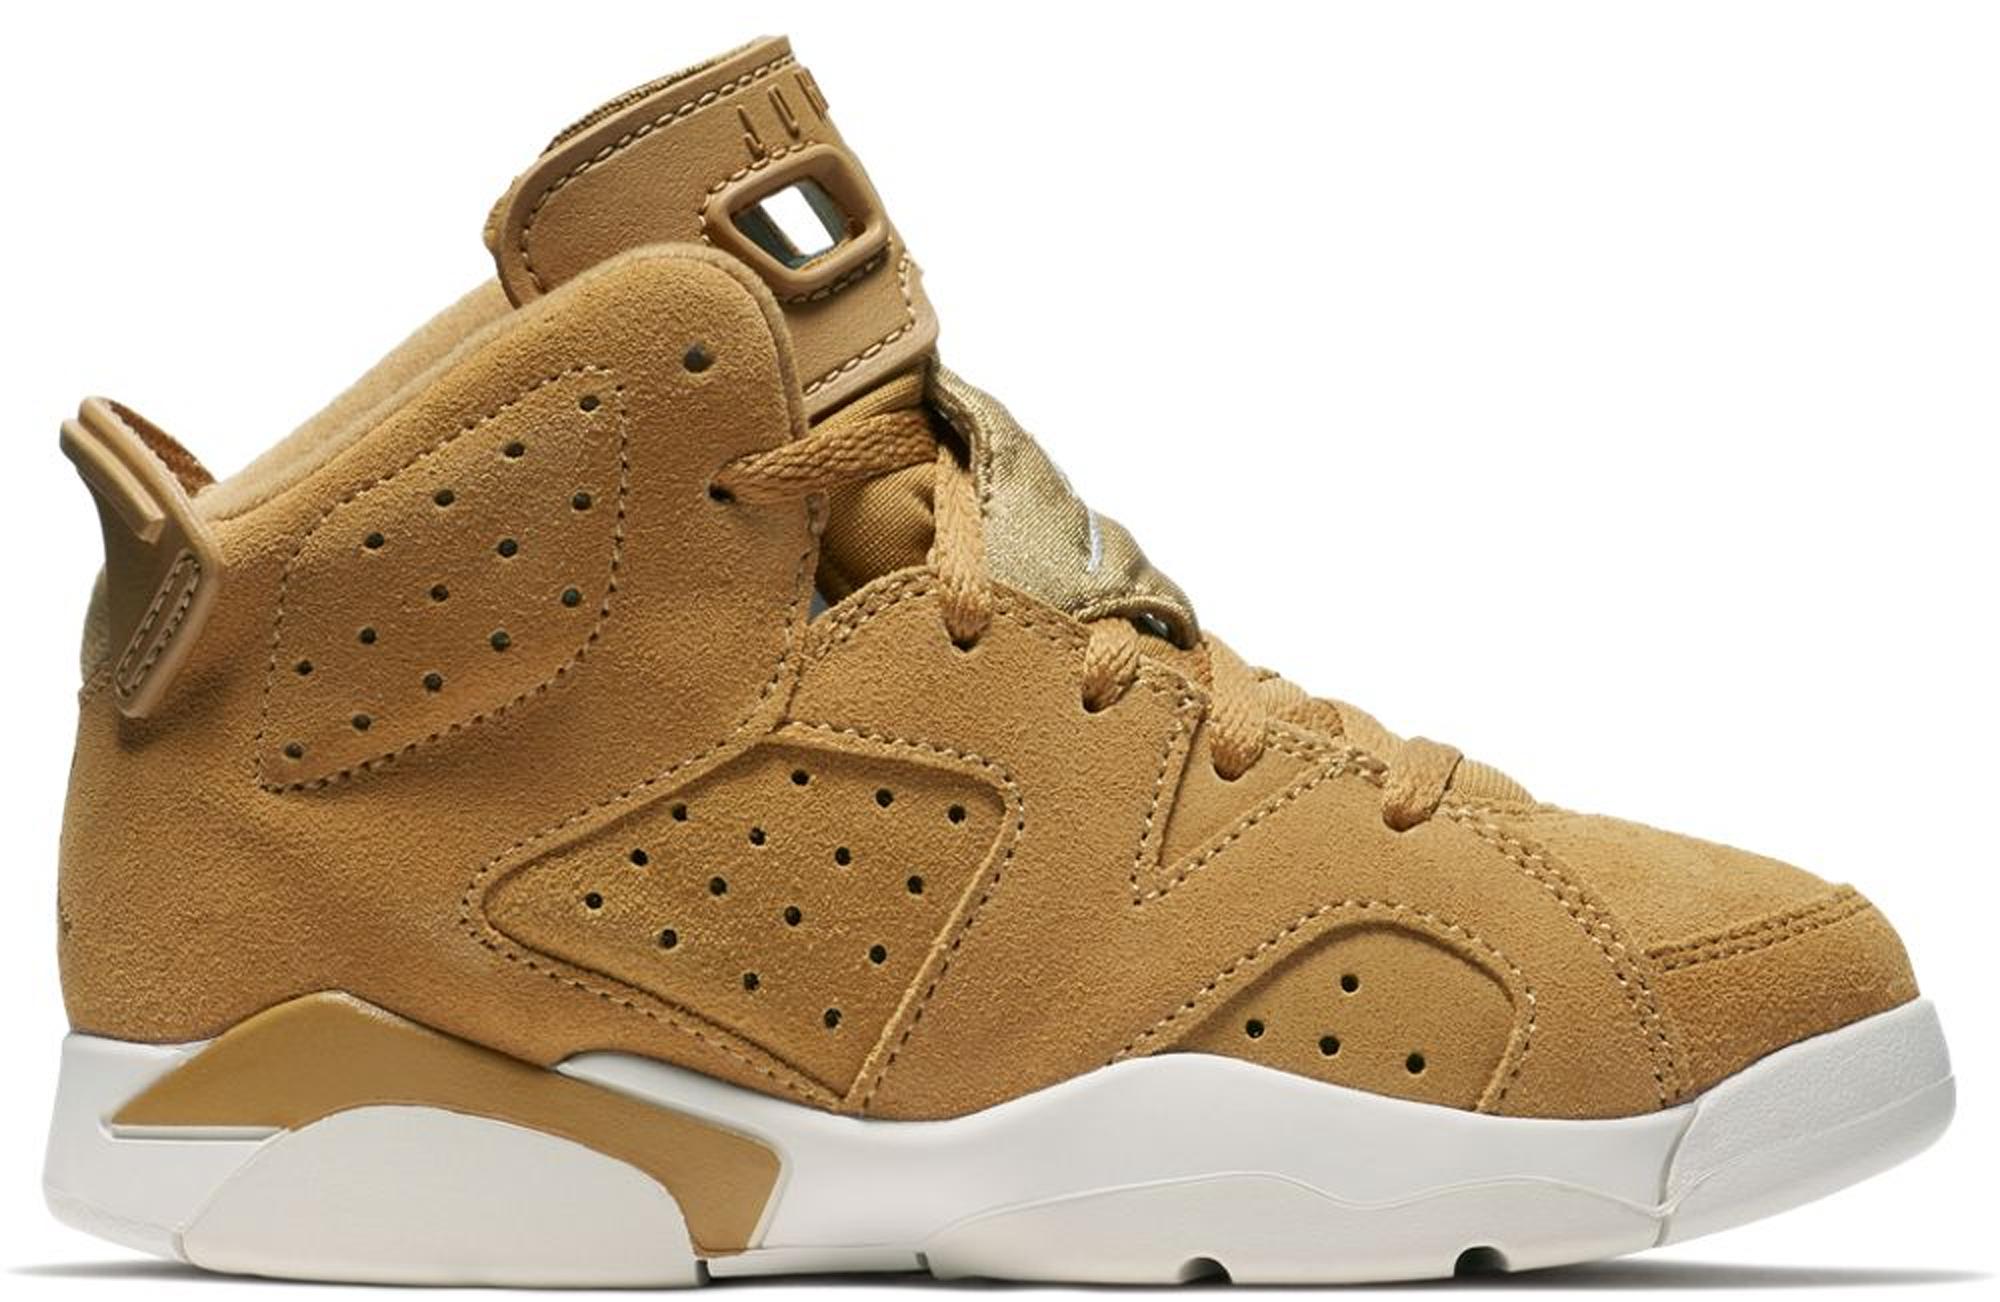 Jordan 6 Retro Golden Harvest (PS